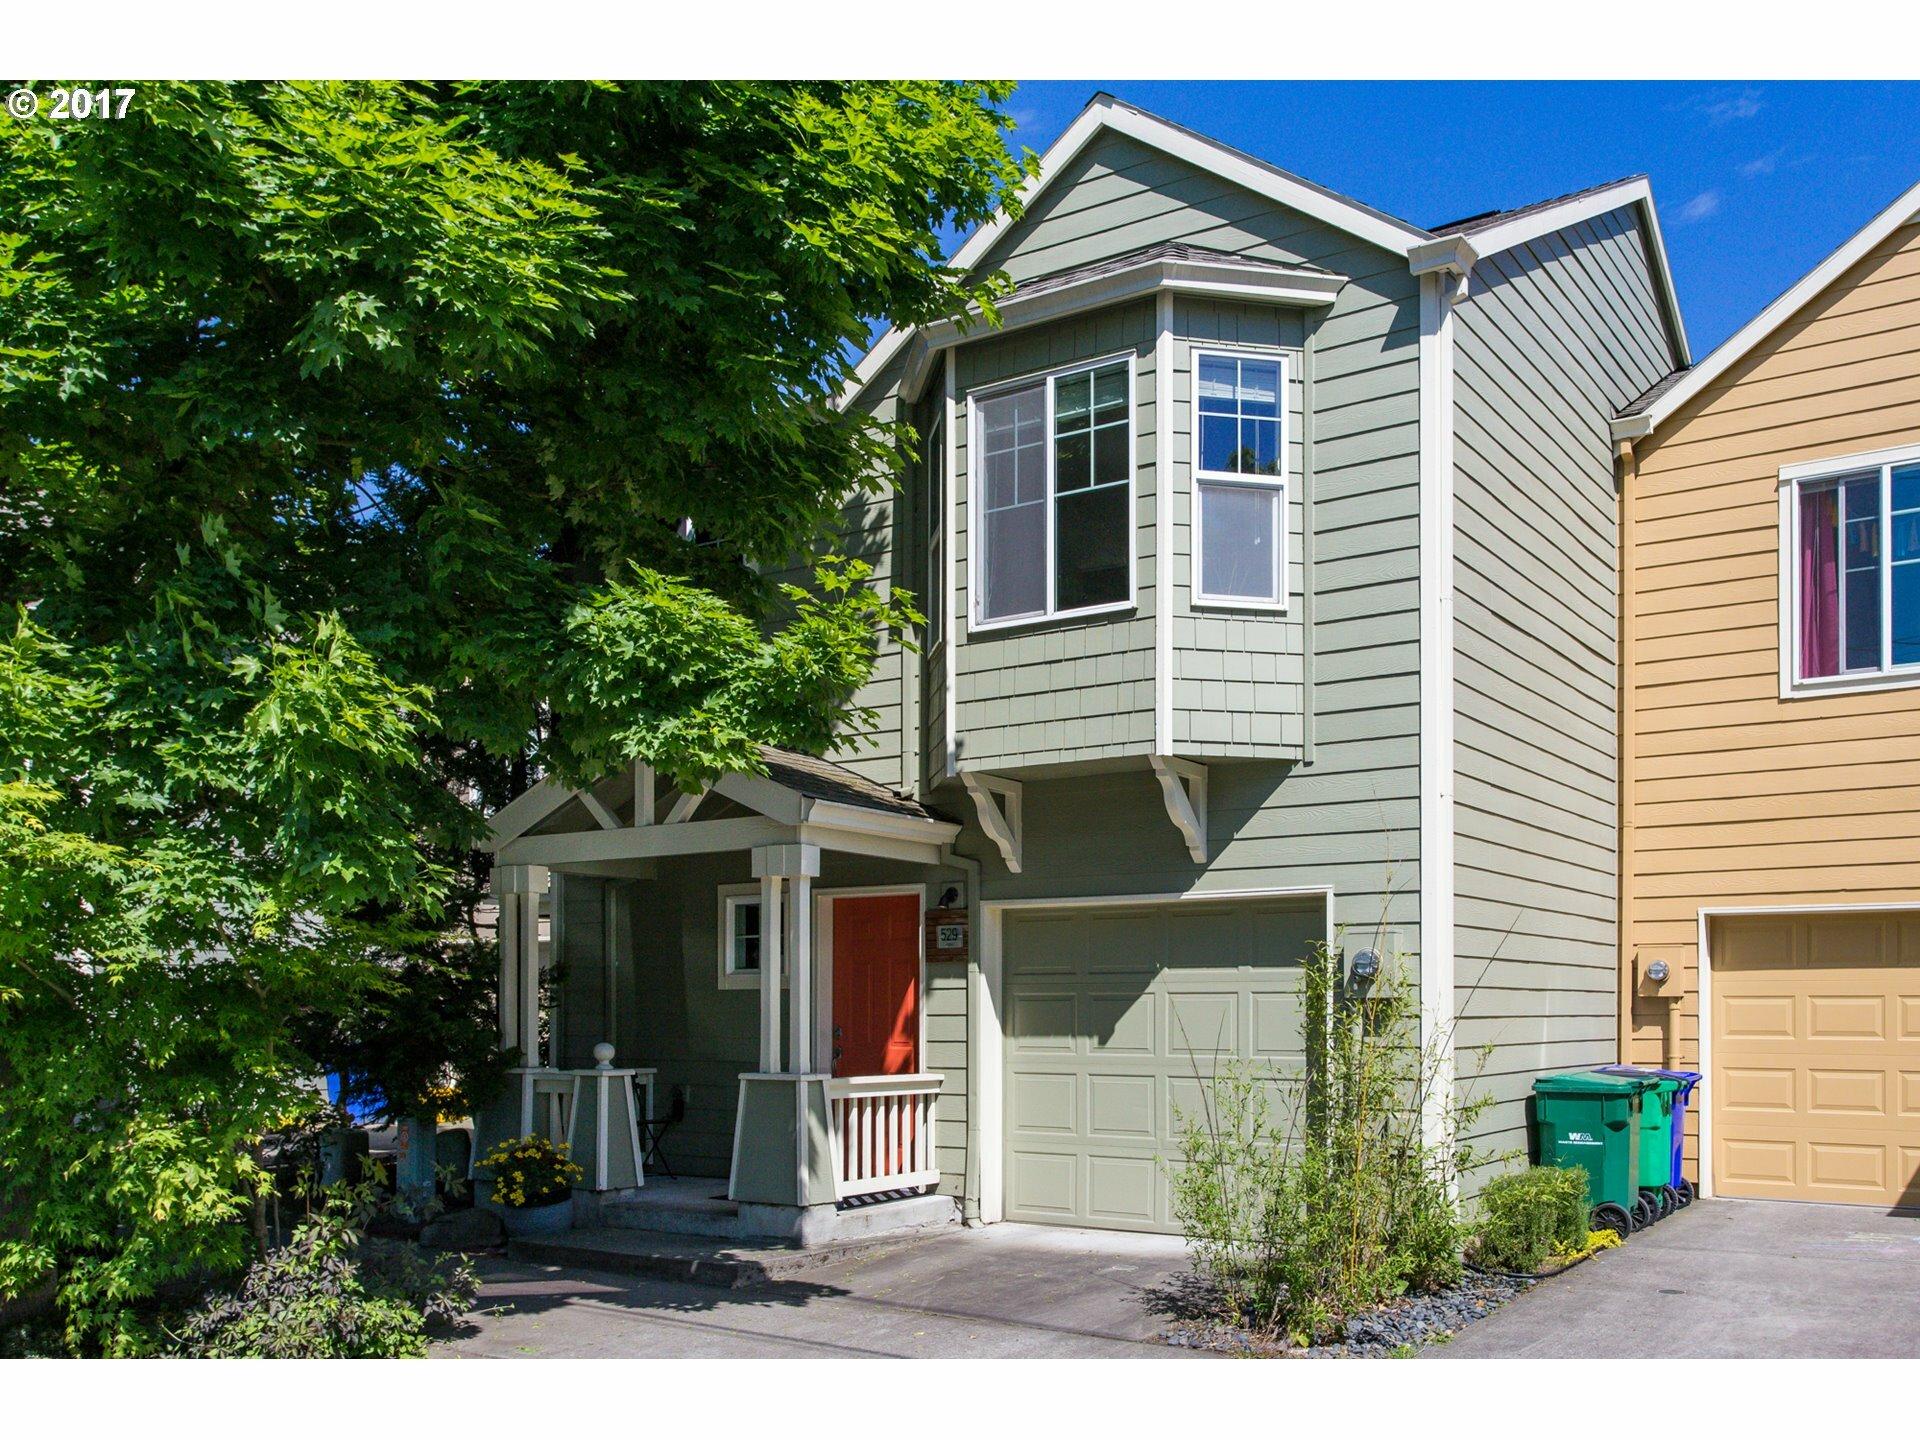 529 Ne Russell St, Portland, OR - USA (photo 1)